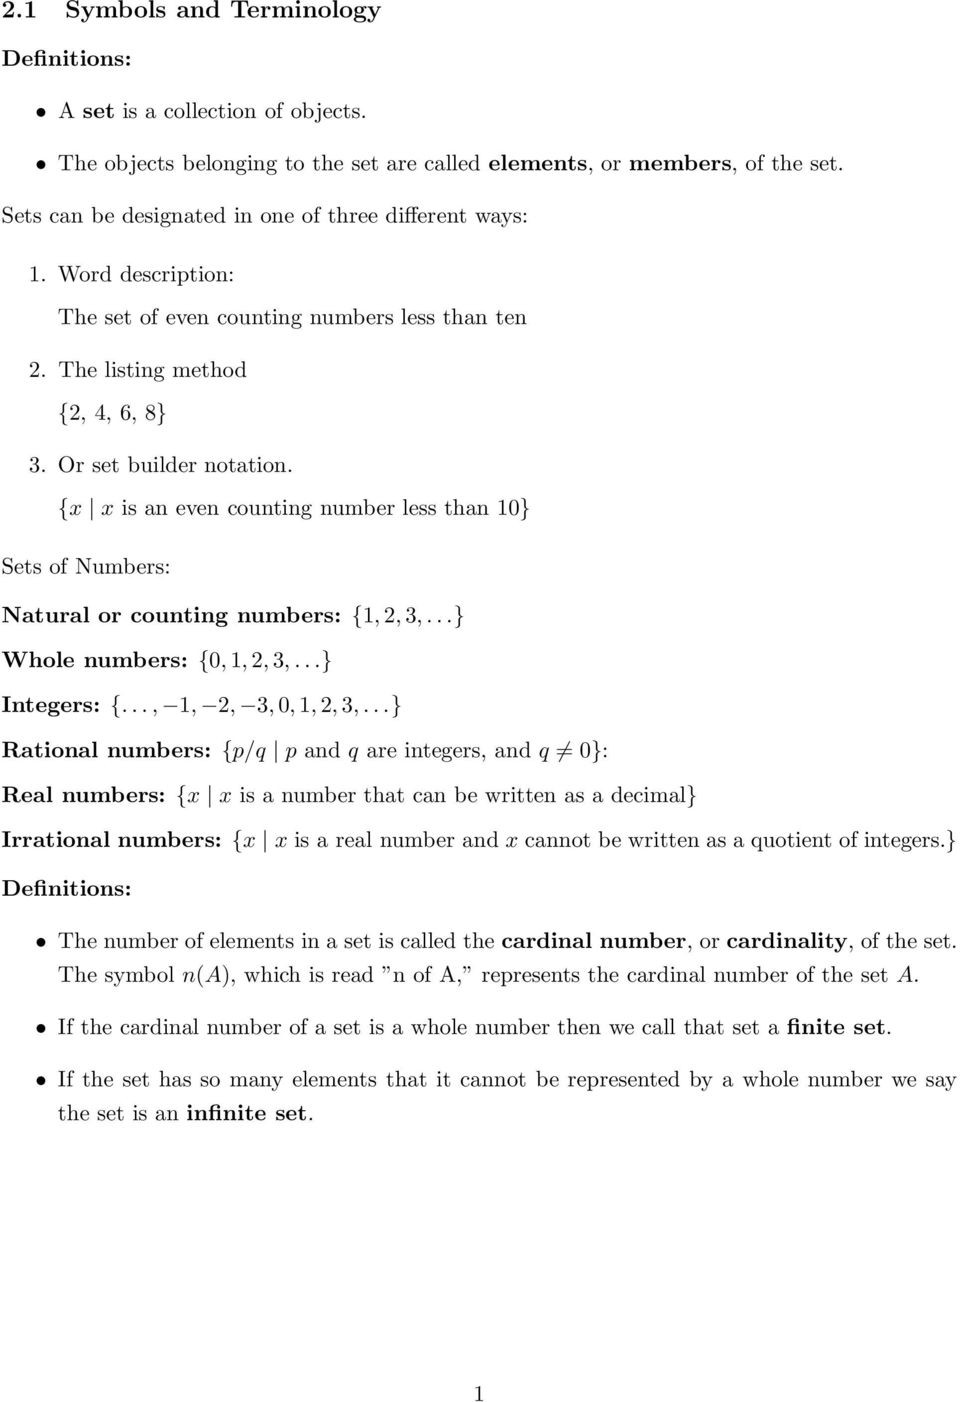 Set Builder Notation Worksheet 2 1 Symbols and Terminology Pdf Free Download